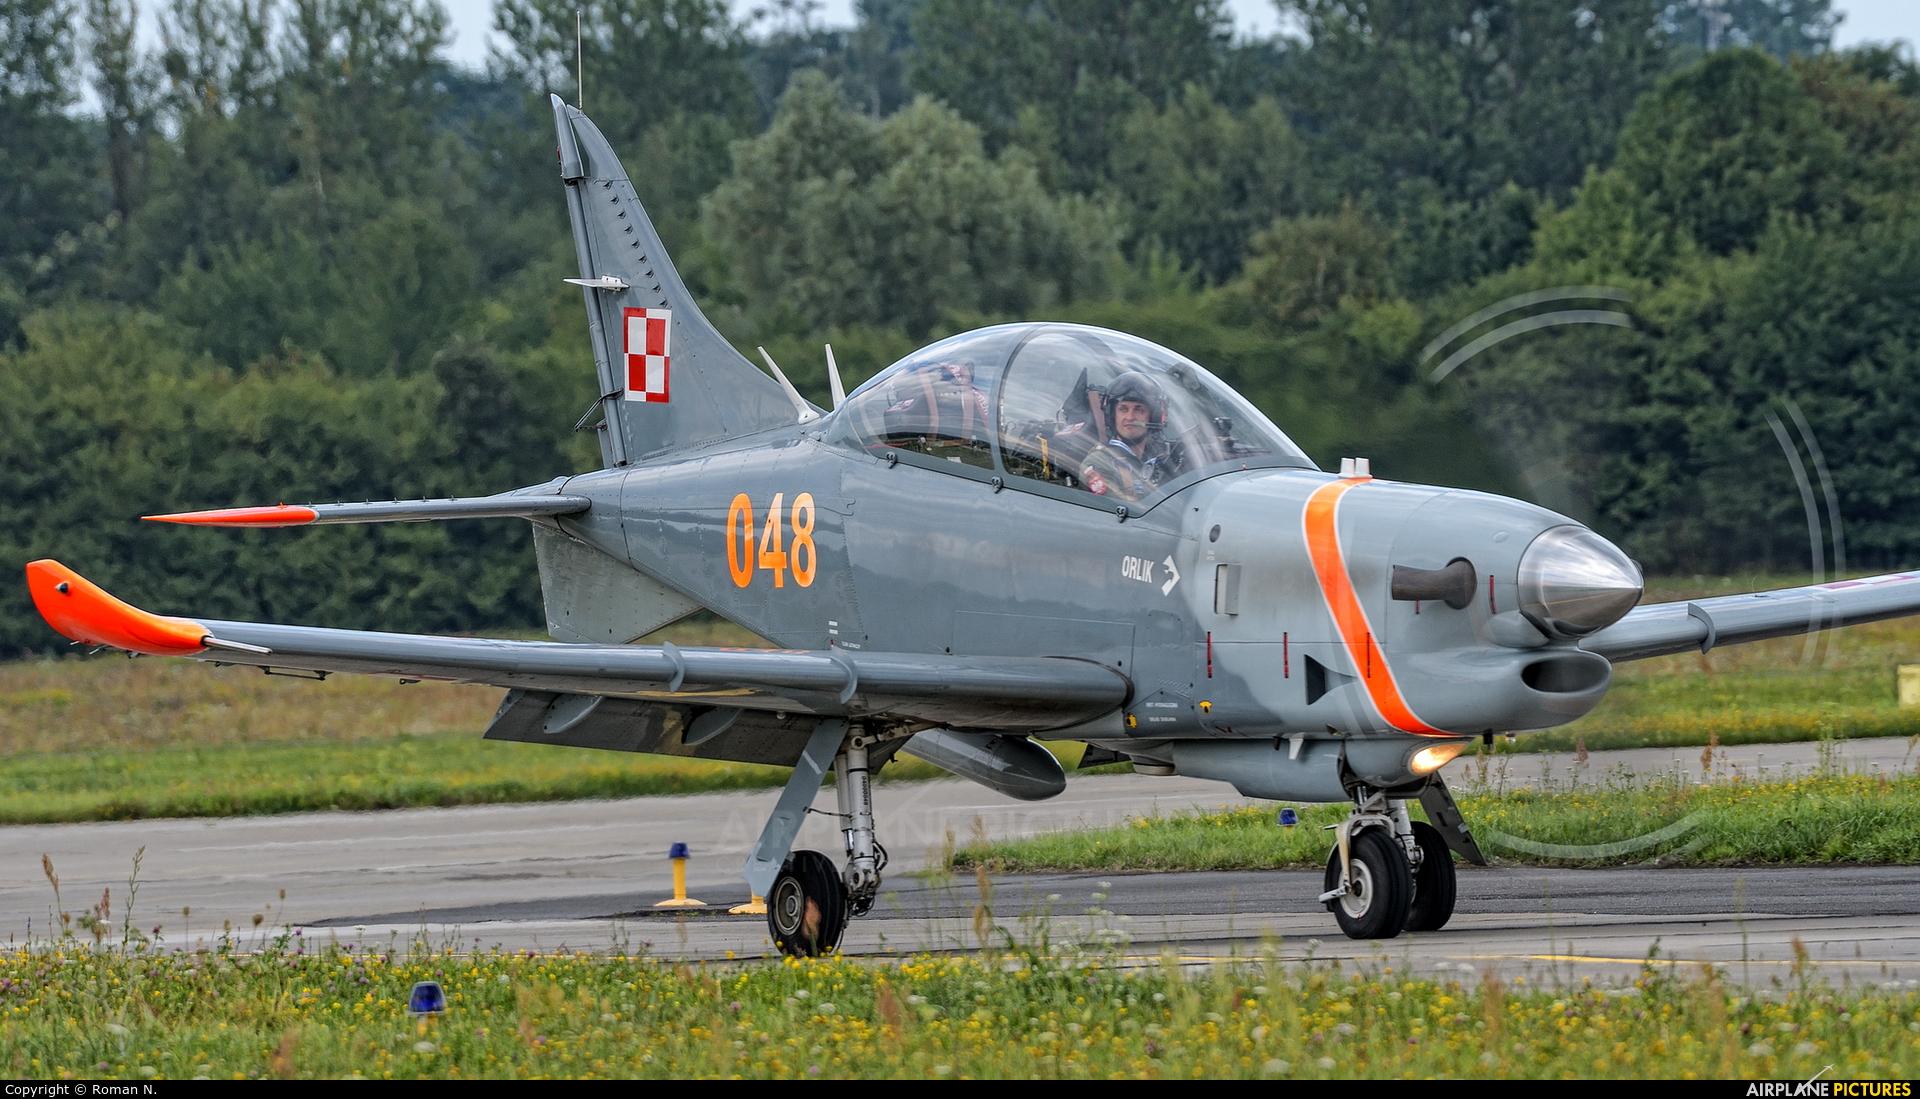 "Poland - Air Force ""Orlik Acrobatic Group"" 048 aircraft at Gdynia- Babie Doły (Oksywie)"